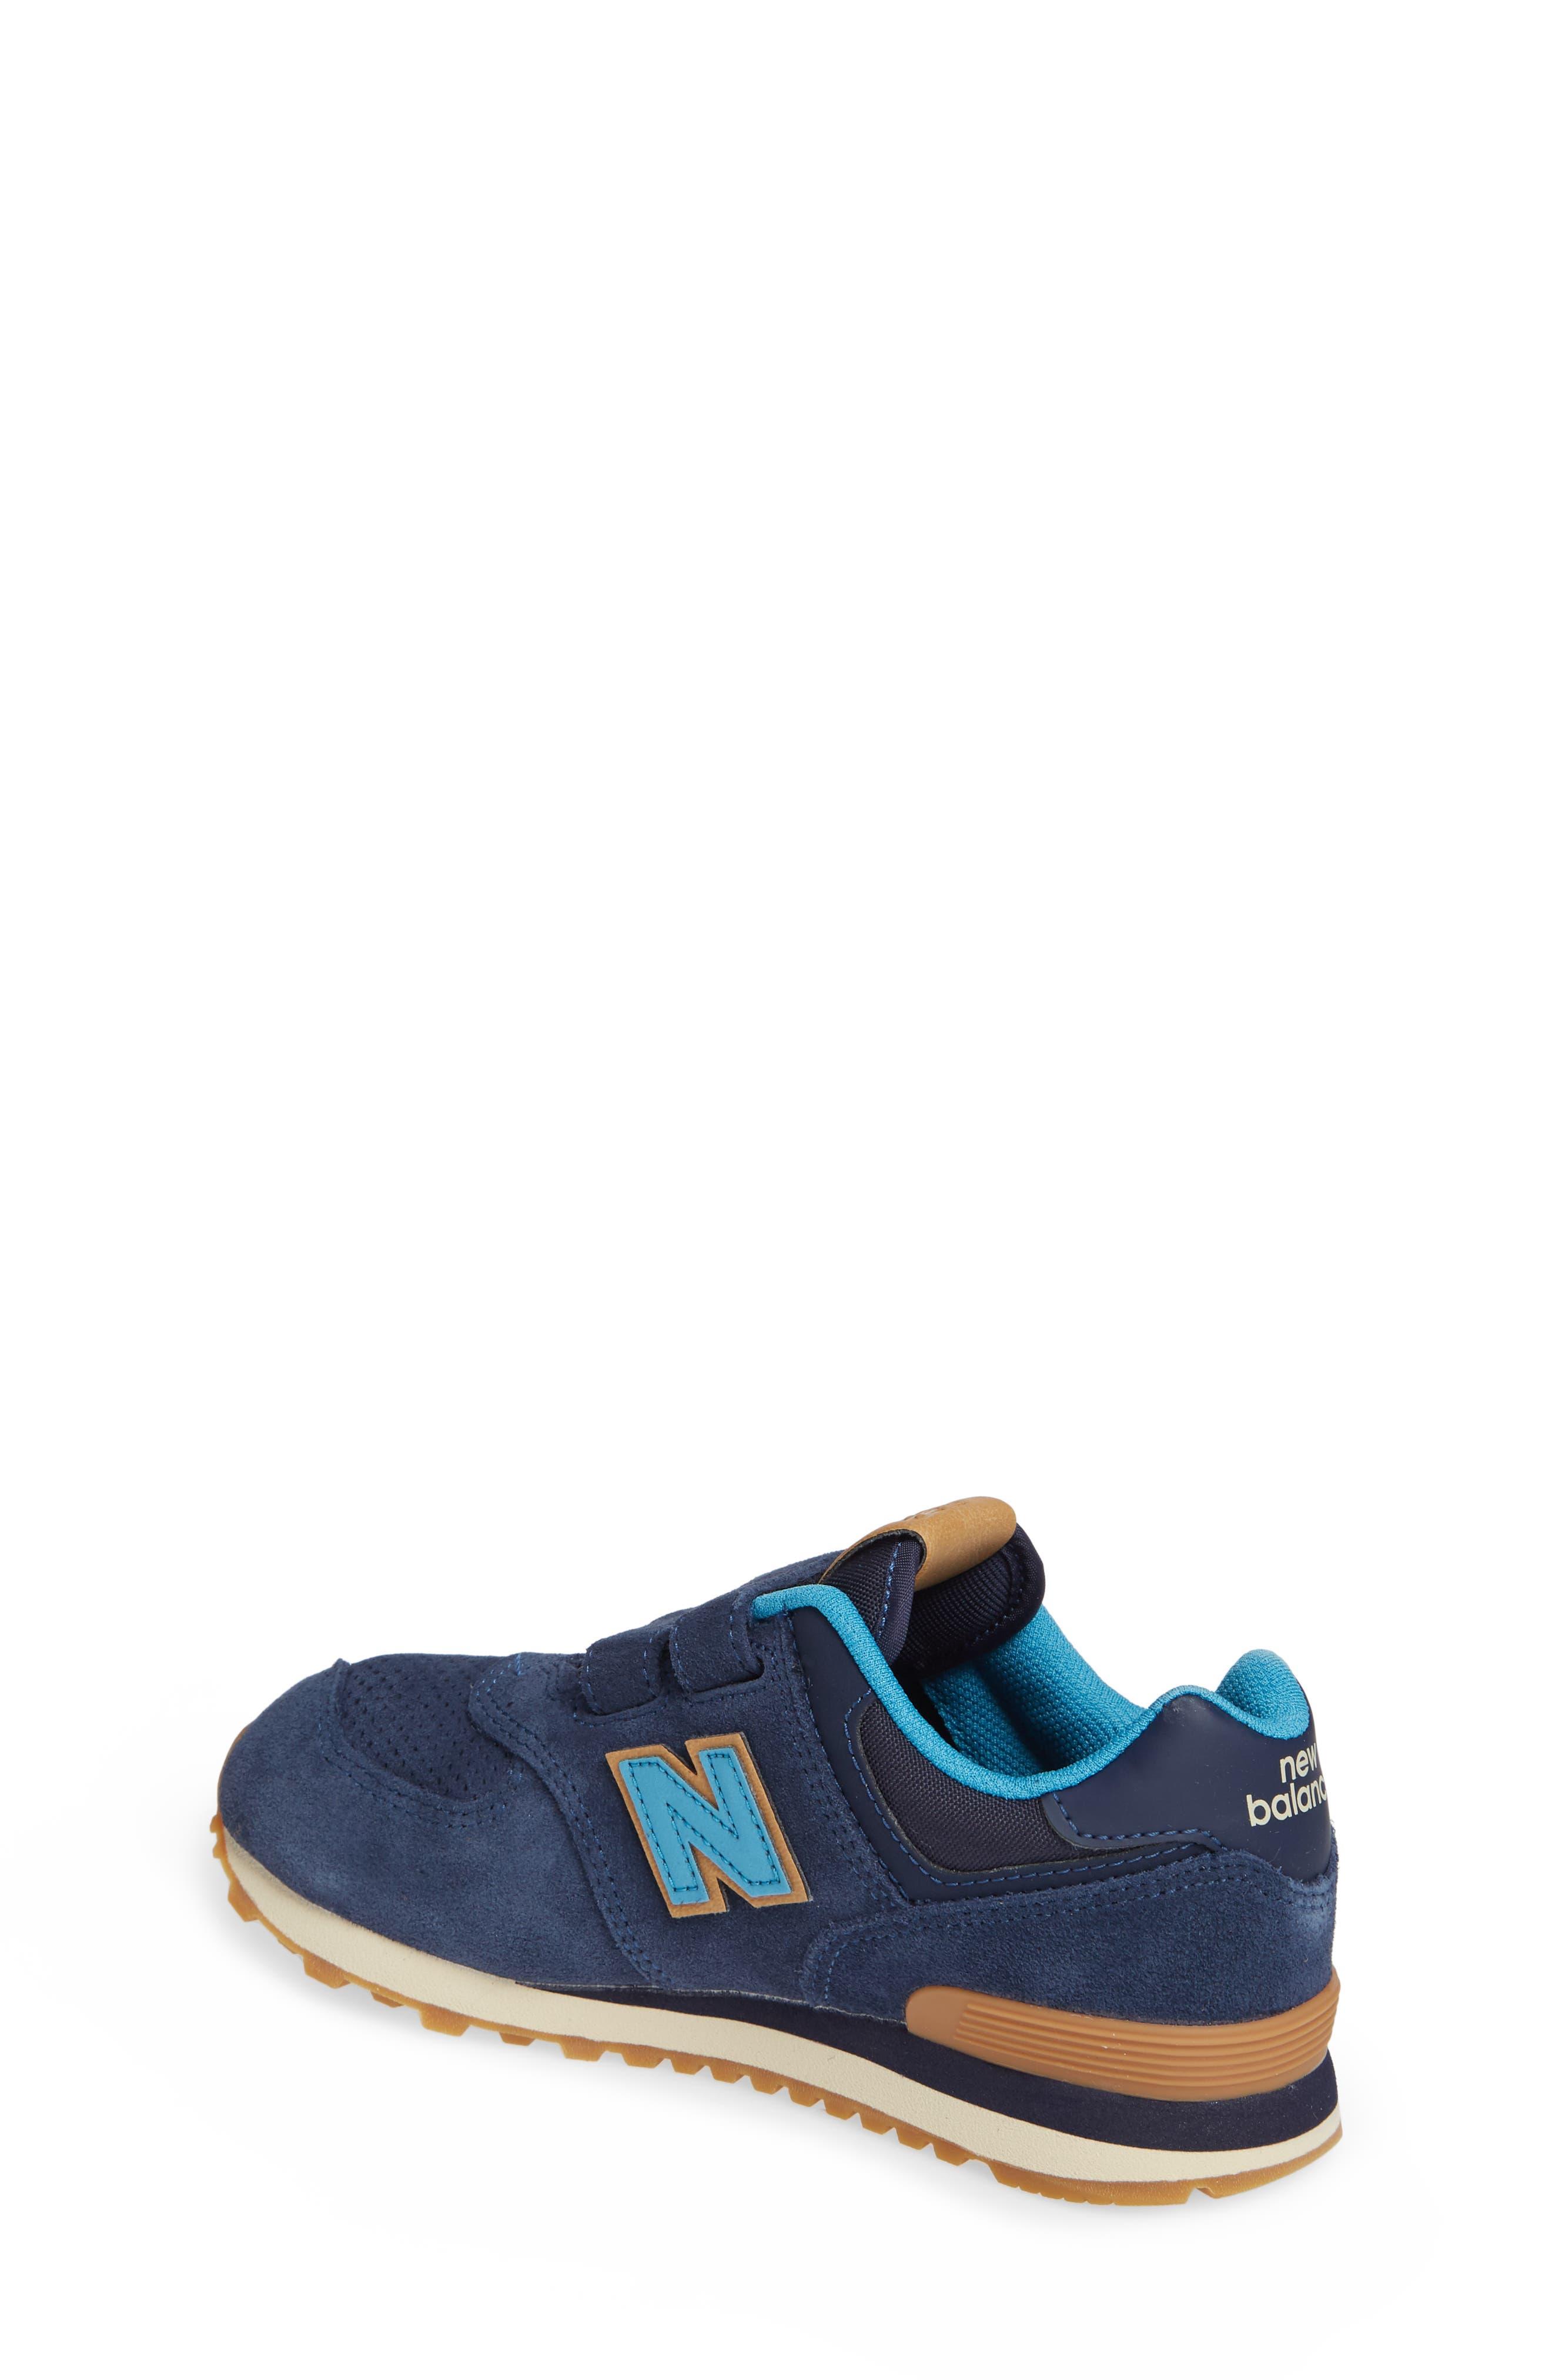 574 Sneaker,                             Alternate thumbnail 2, color,                             PIGMENT